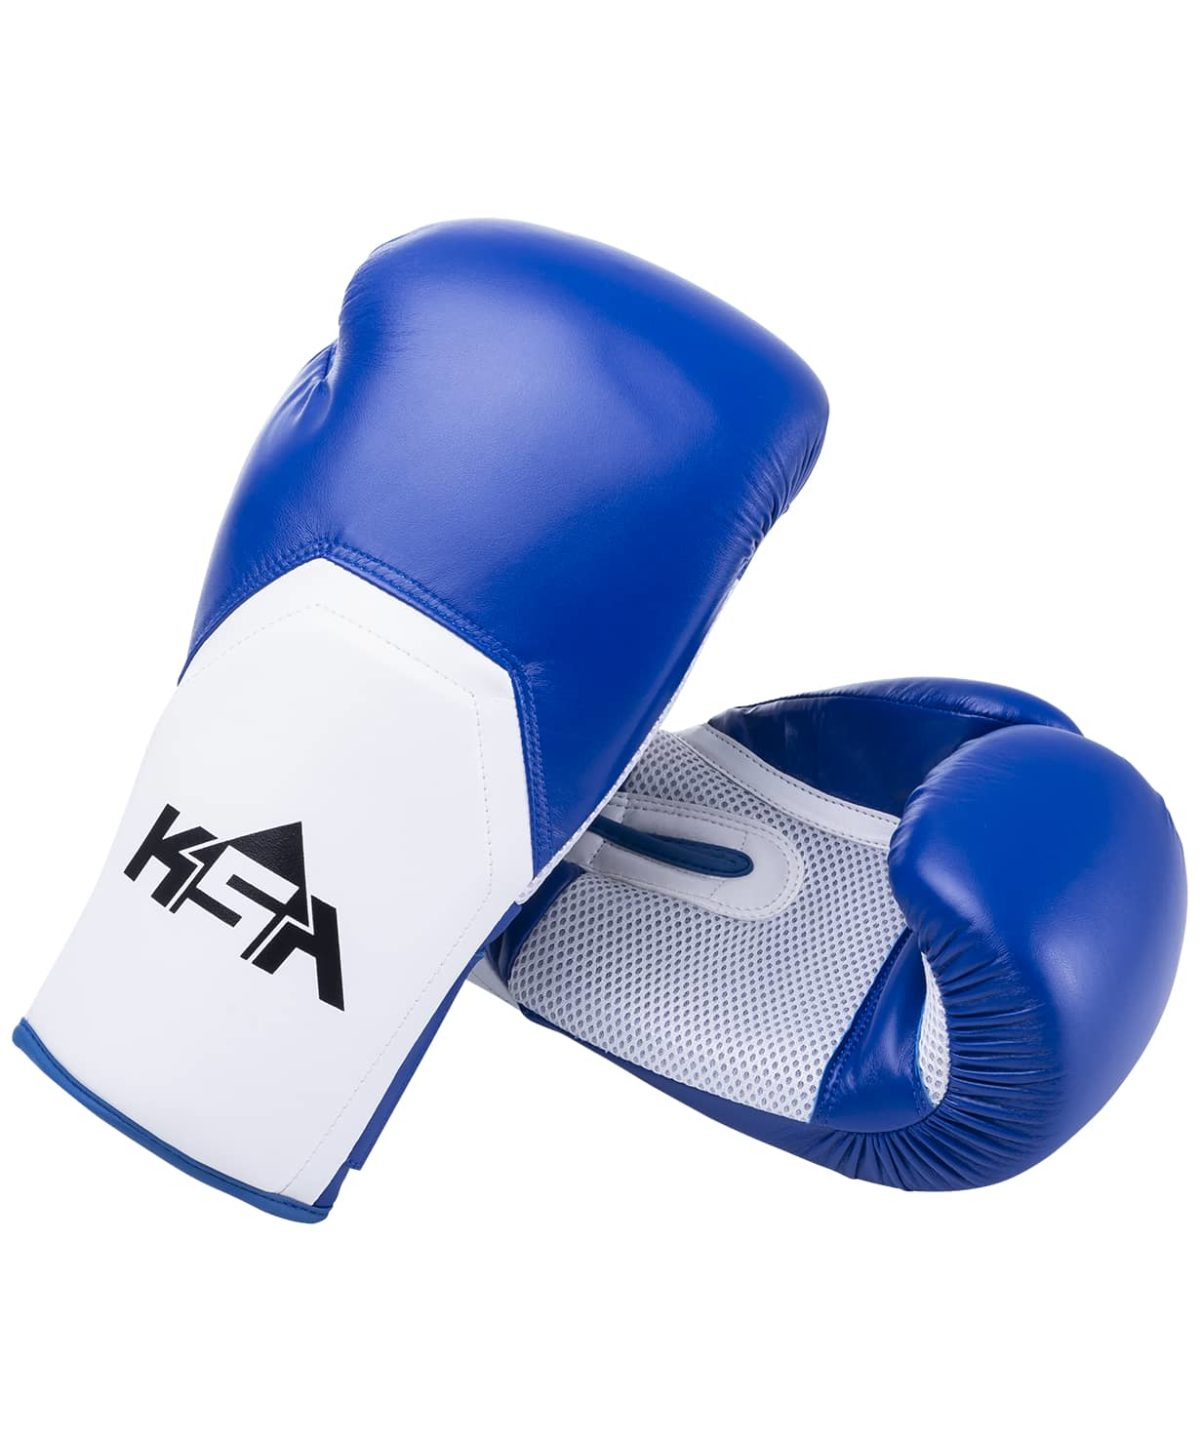 KSA Персатки боксерские, 10 oz, к/з Scorpio  17818 - 1